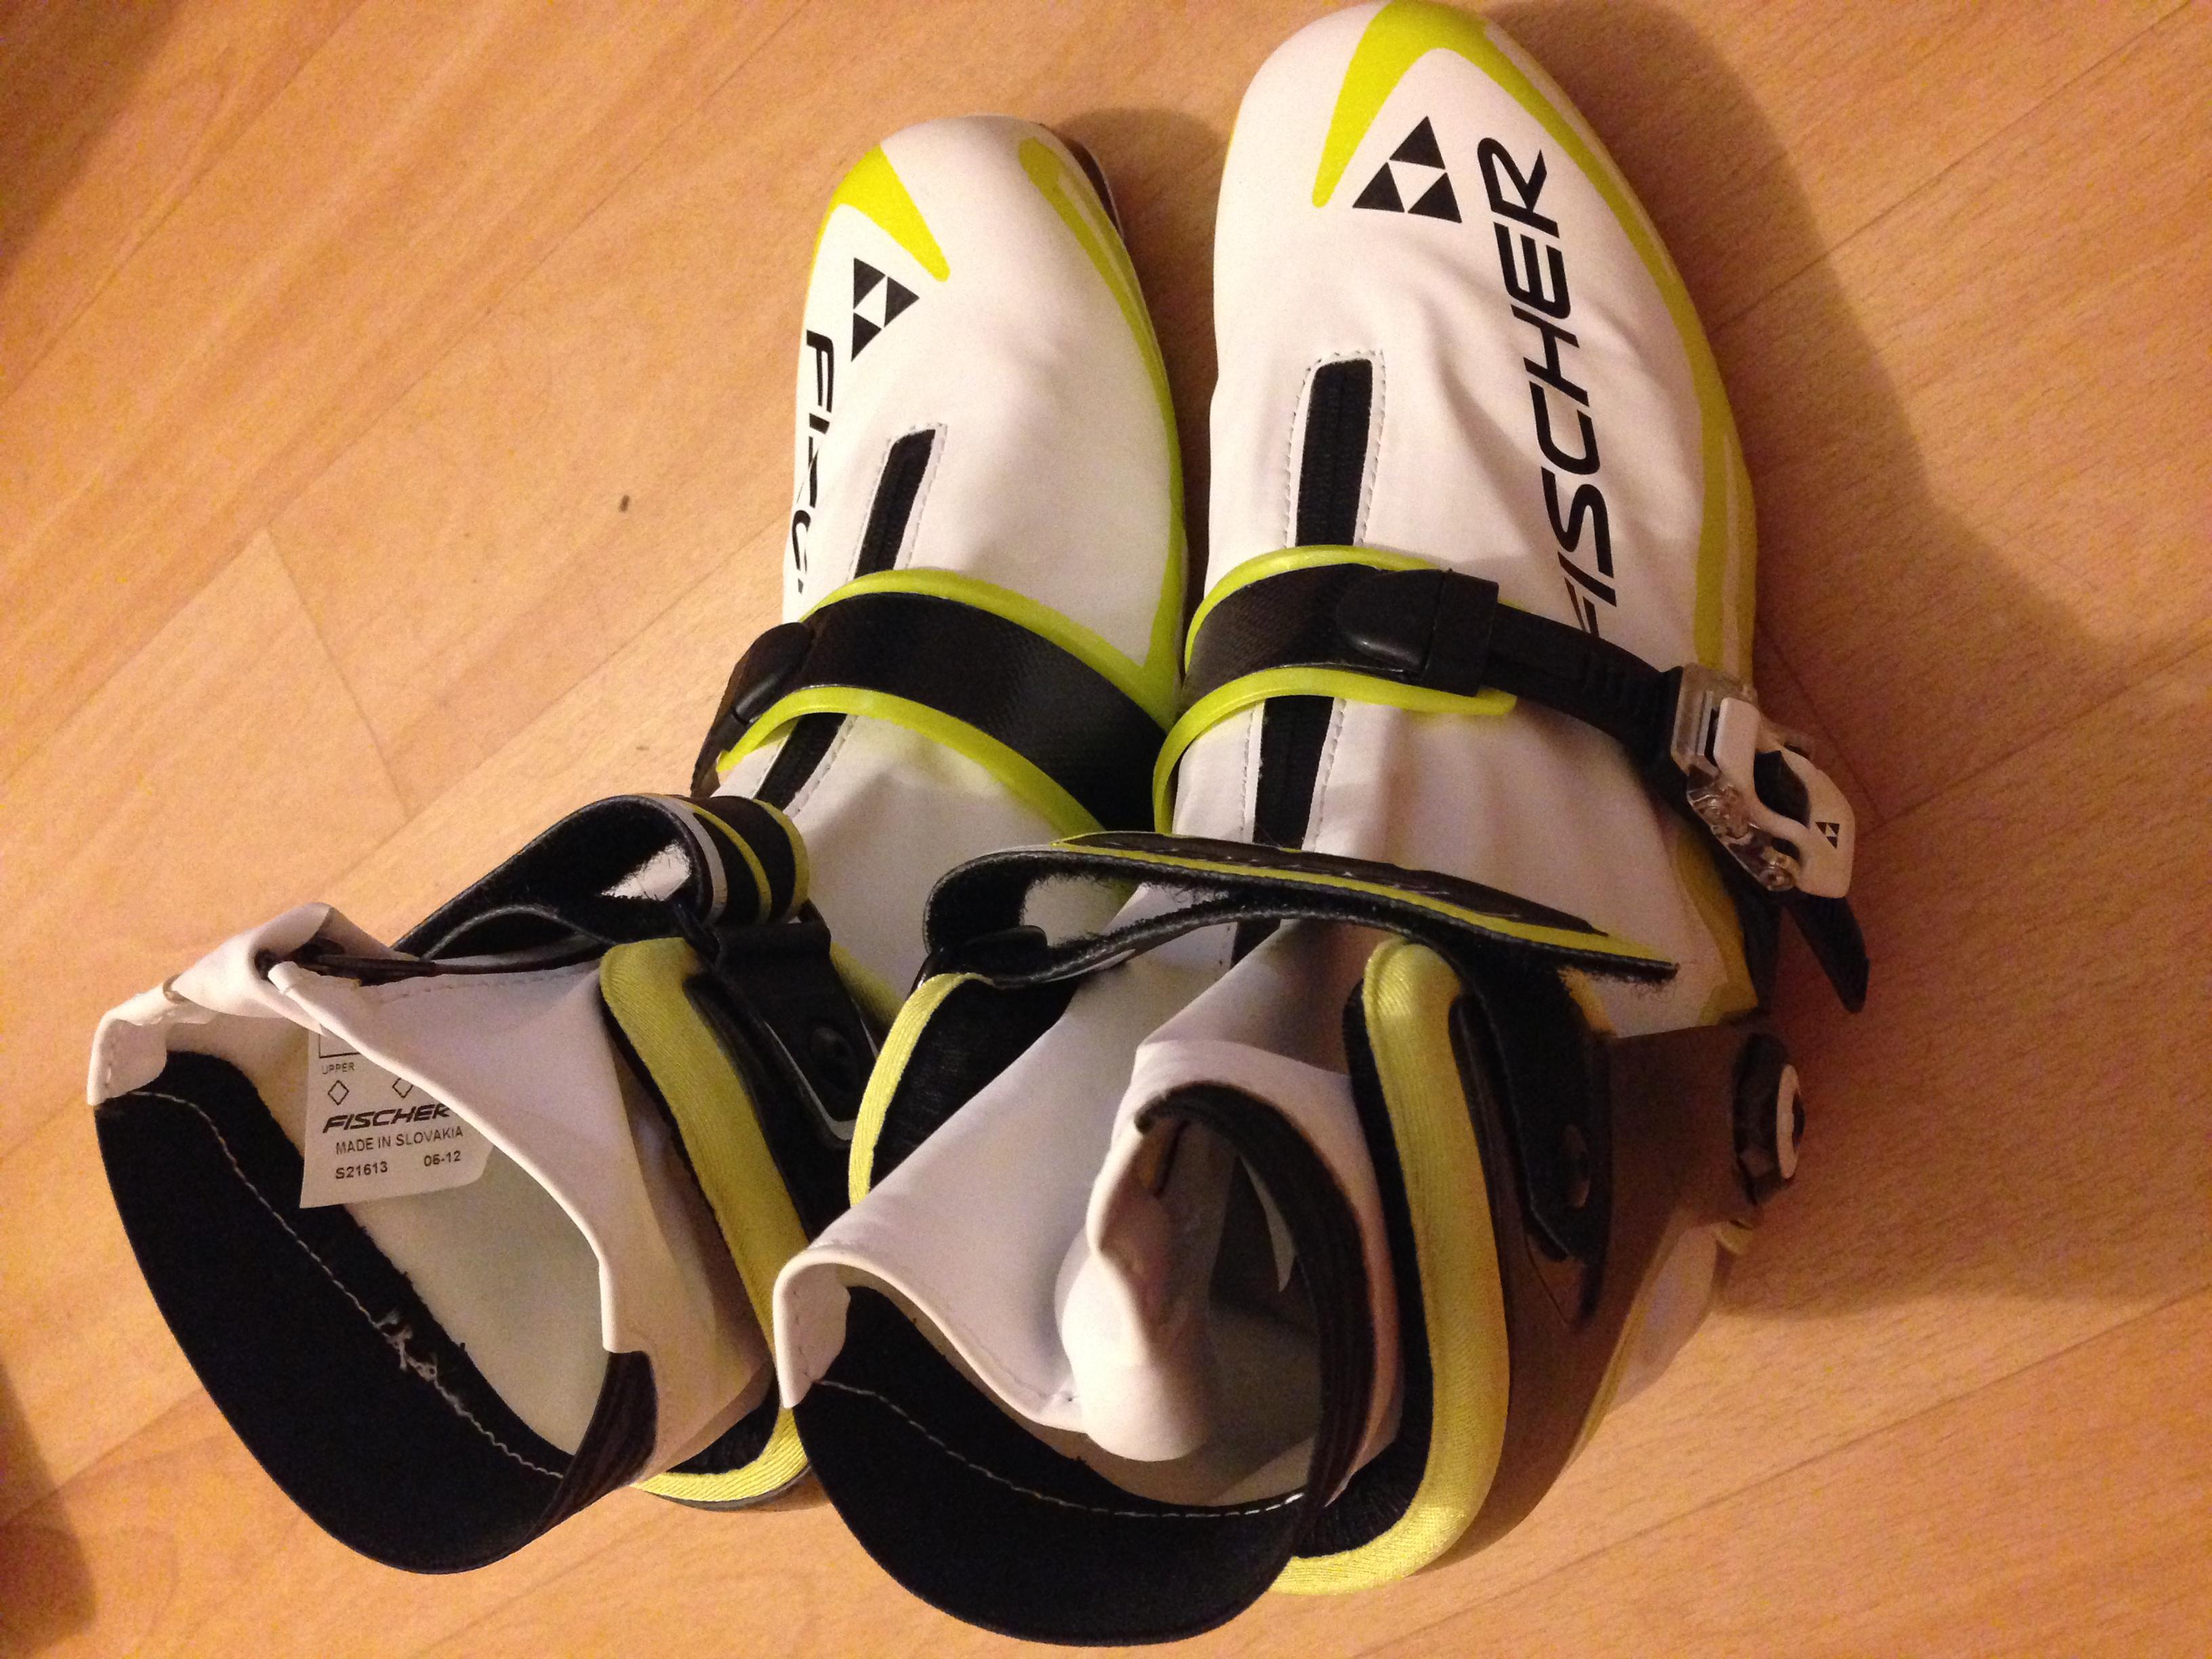 Běžkařské boty Fisher RCS Skating carbonlite 38 e5a15c15a8b